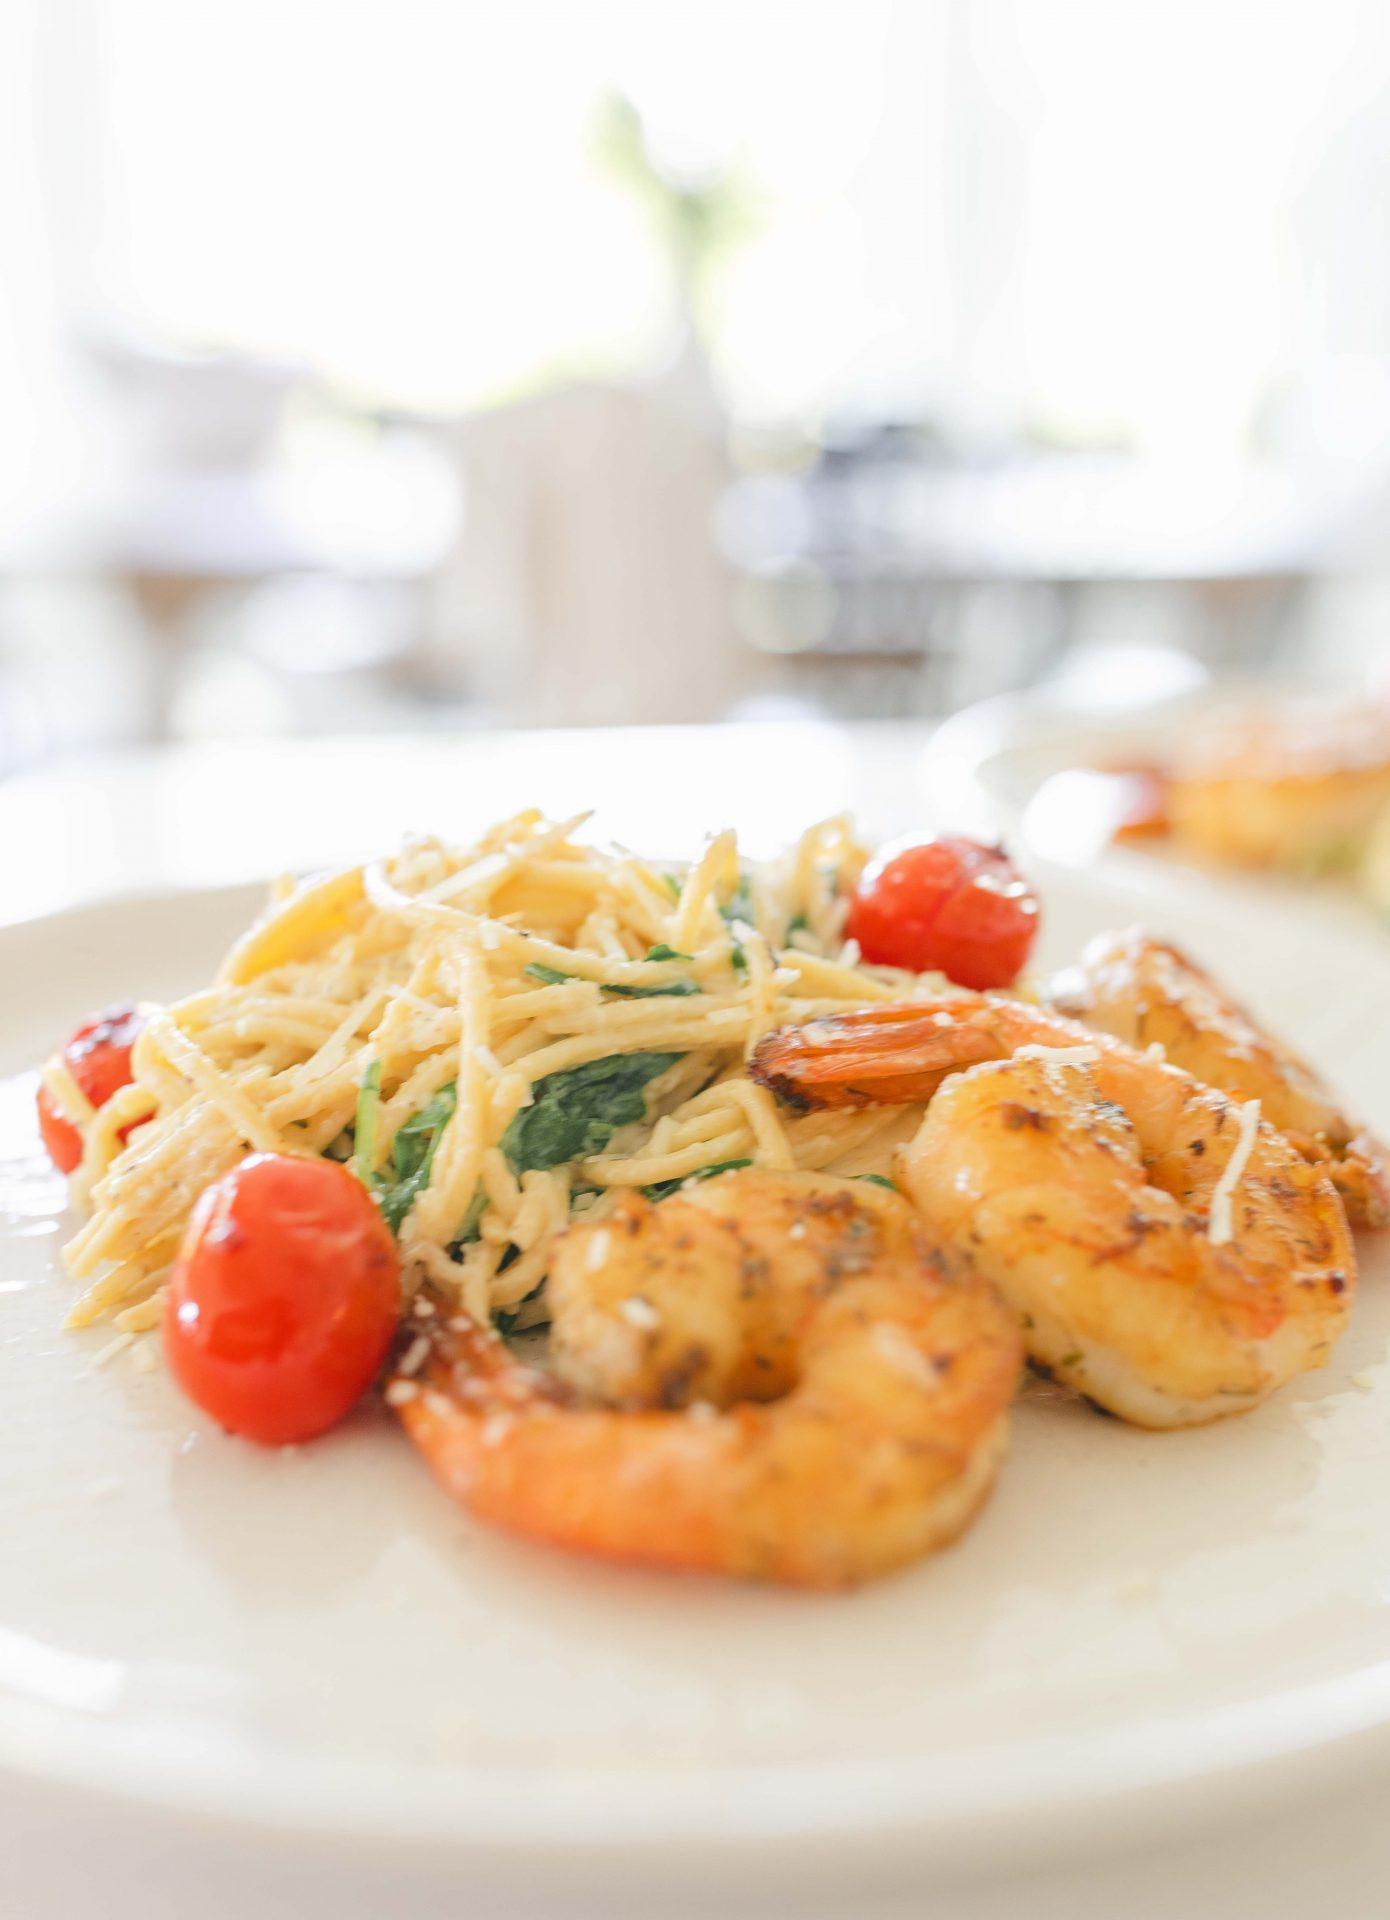 shrimp, pasta, carbonara, seafood, tomatoes, spinach, dinner, healthy, gluten-free, parm garlic, peach, citrus, herb, dinner, easy dinner